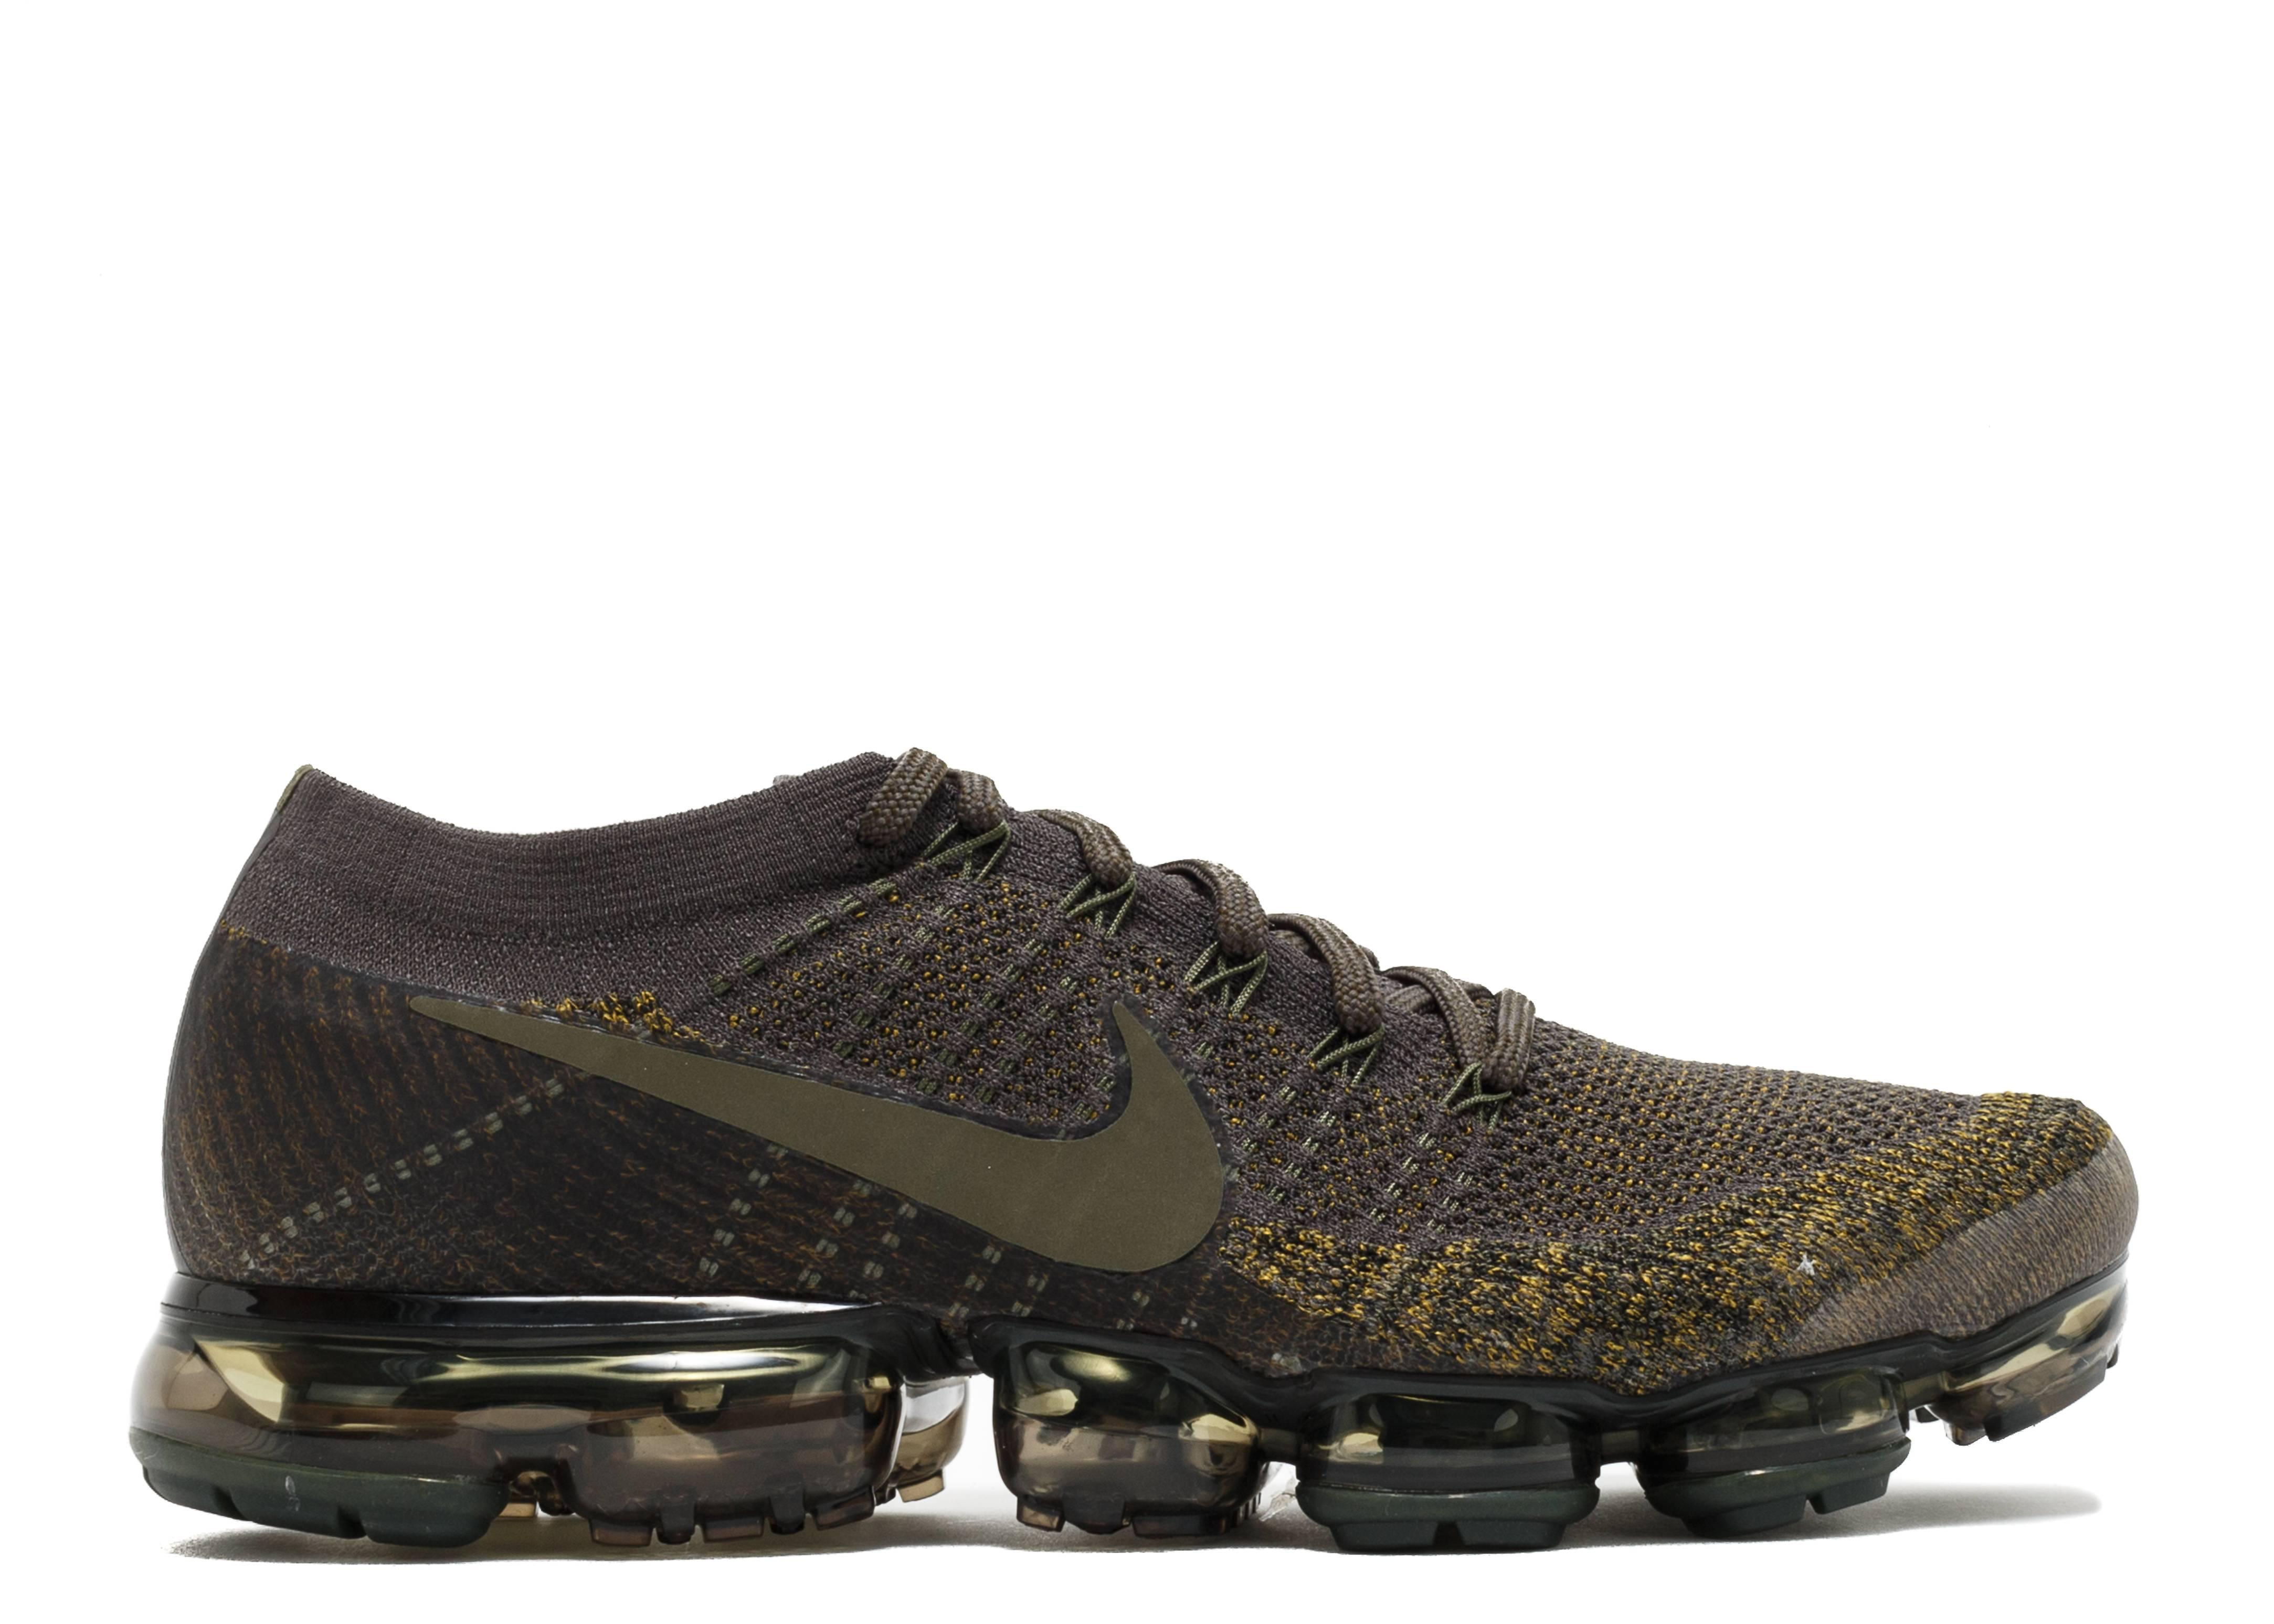 3ff56442029 Nikelab Air Vapormax Flyknit - Nike - 899473 004 - midnight fog cargo khaki